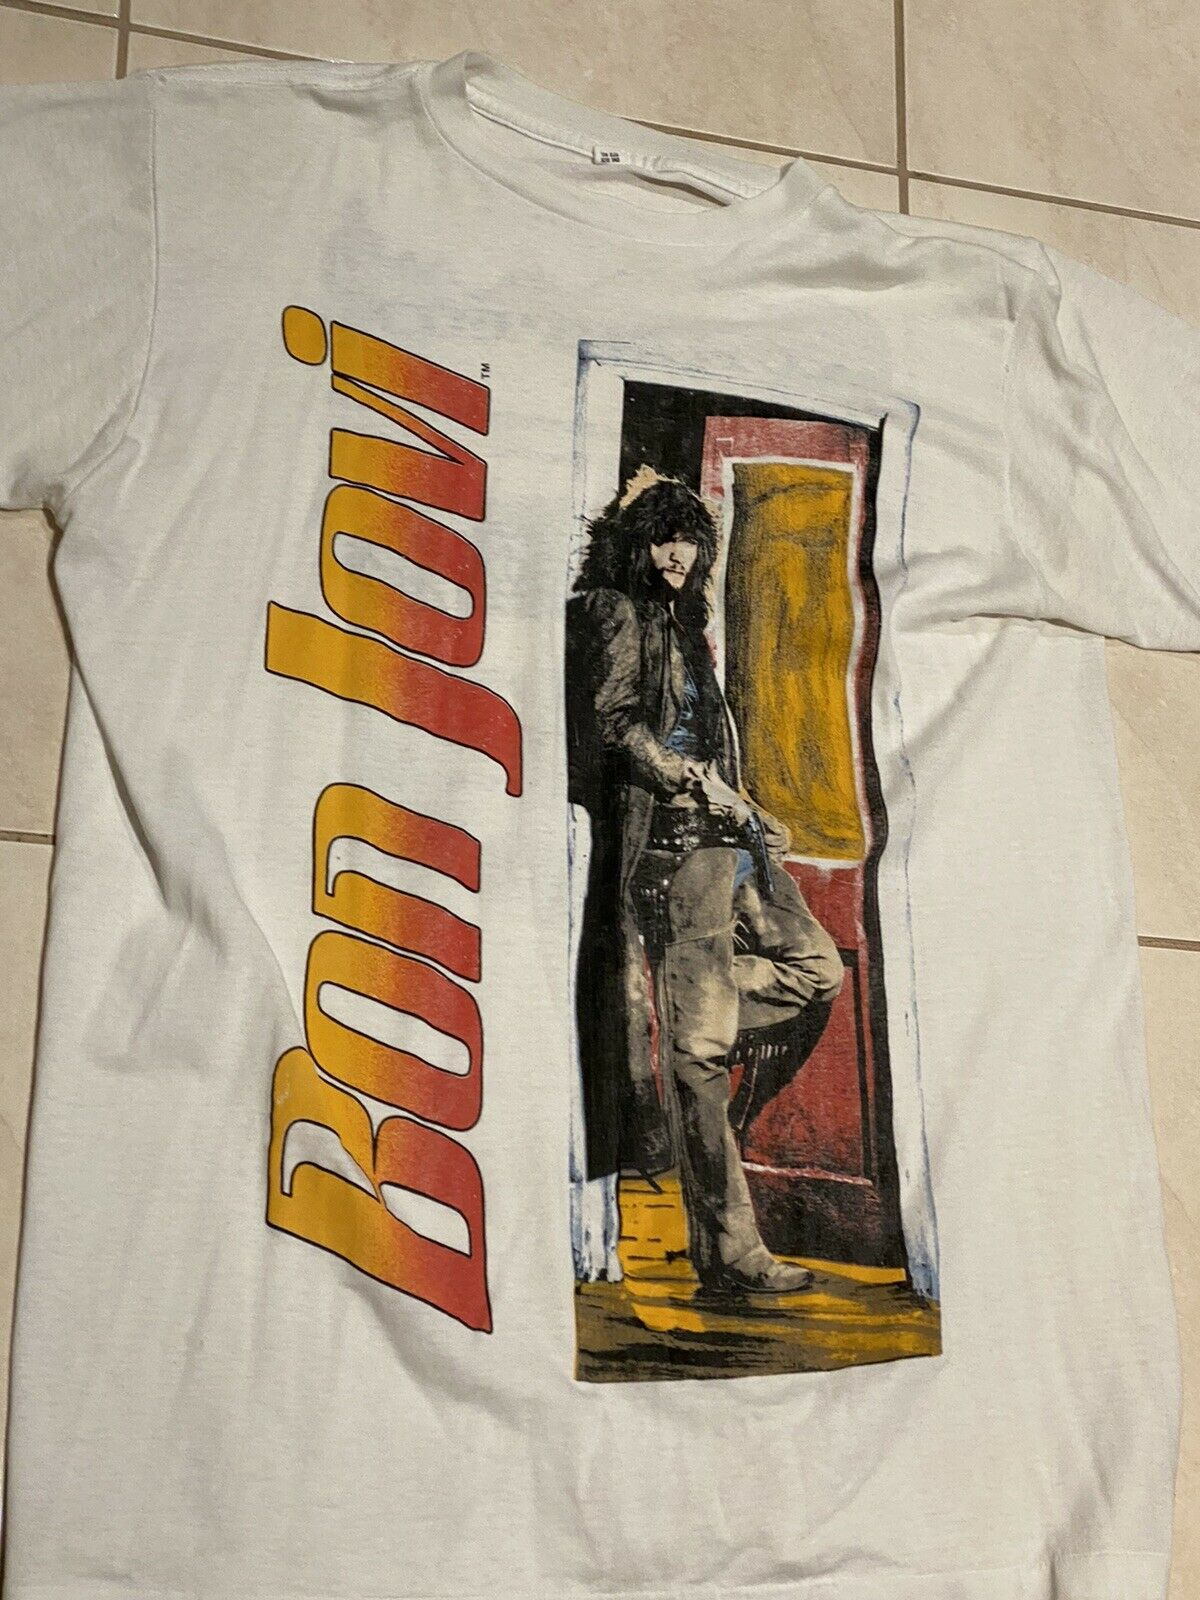 BON JOVI SLIPPERY WHEN WET WORLD TOUR 1986 Hommes T Shirt Rock Band album Merch